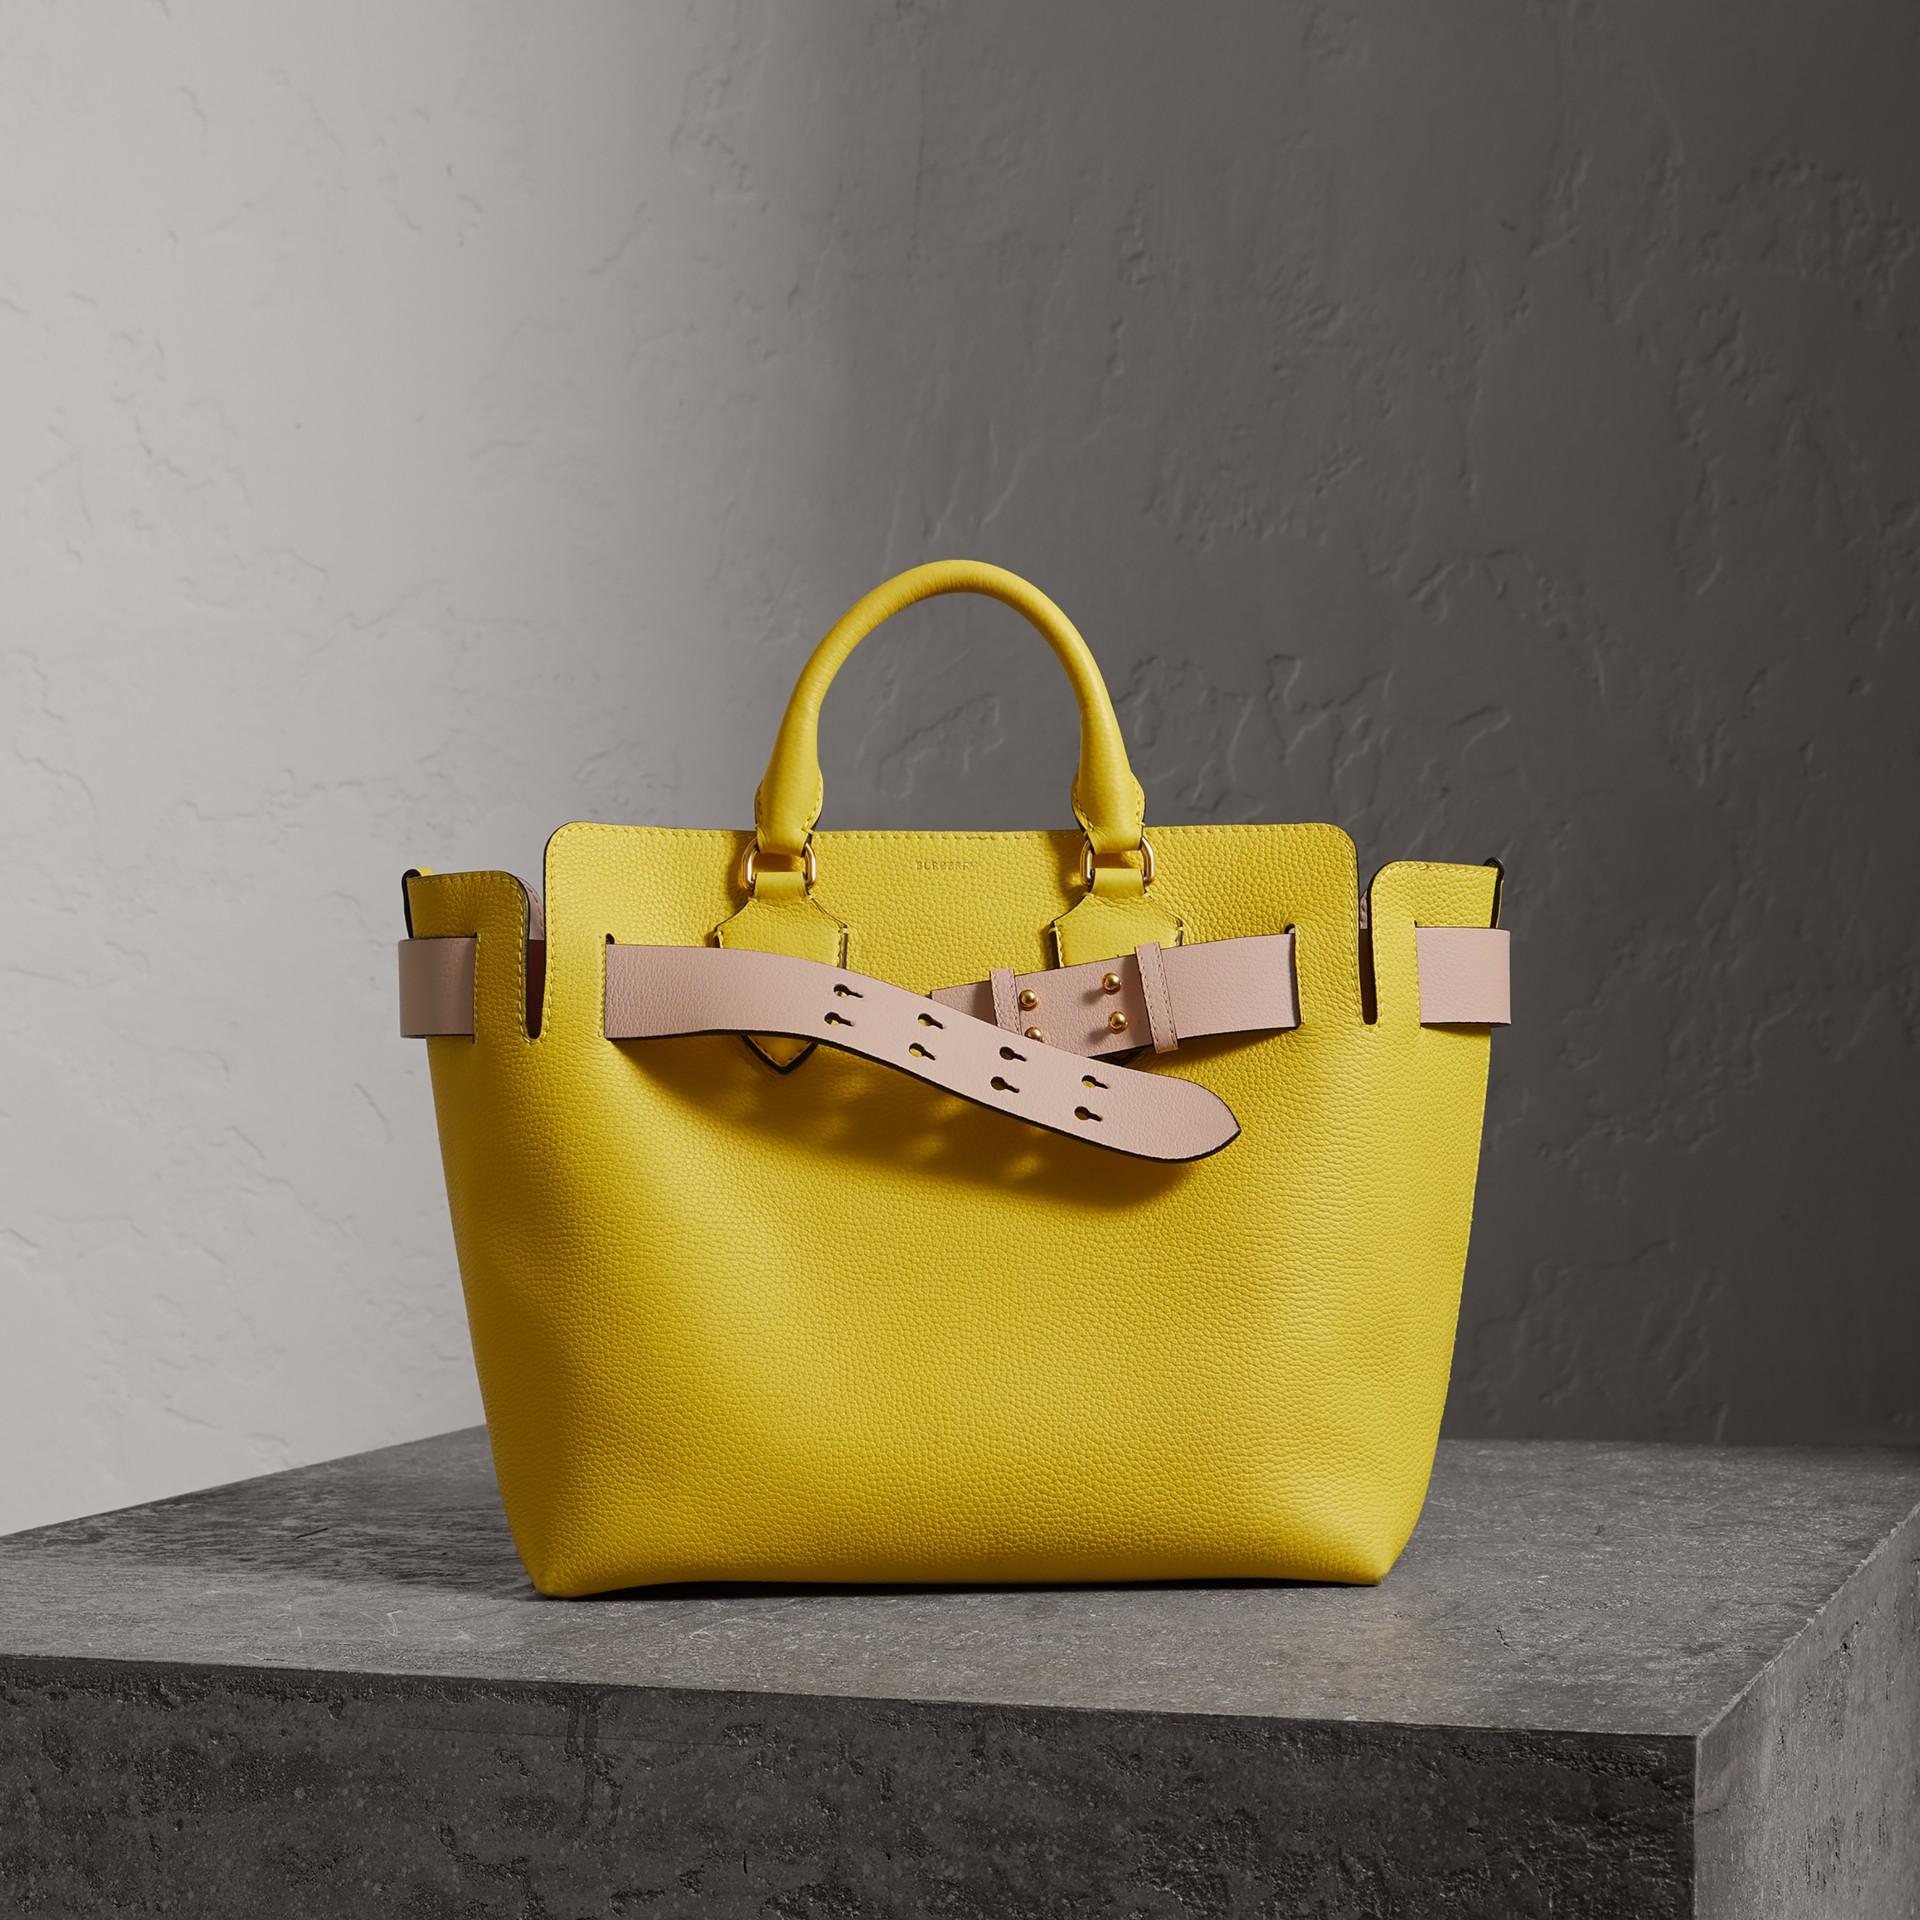 Burberry The Medium Belt Bag Aus Leder In Bright Larch Yellow   ModeSens 71b5abbac0